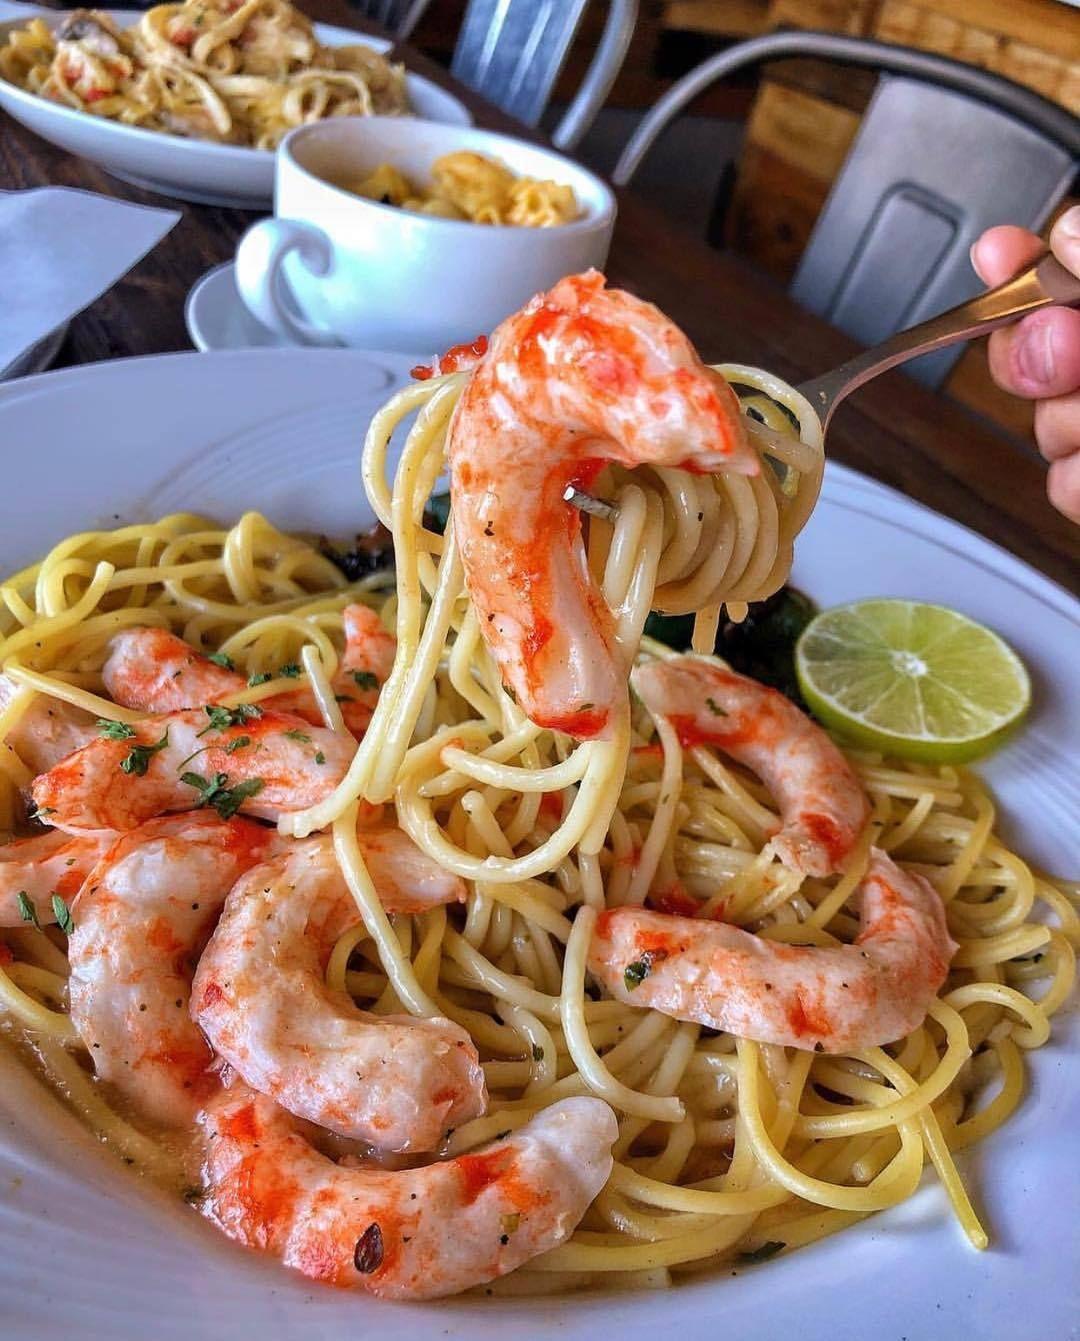 100 Vegan Shrimp Pasta Source Vegan Shrimp Food Shrimp Pasta Dishes